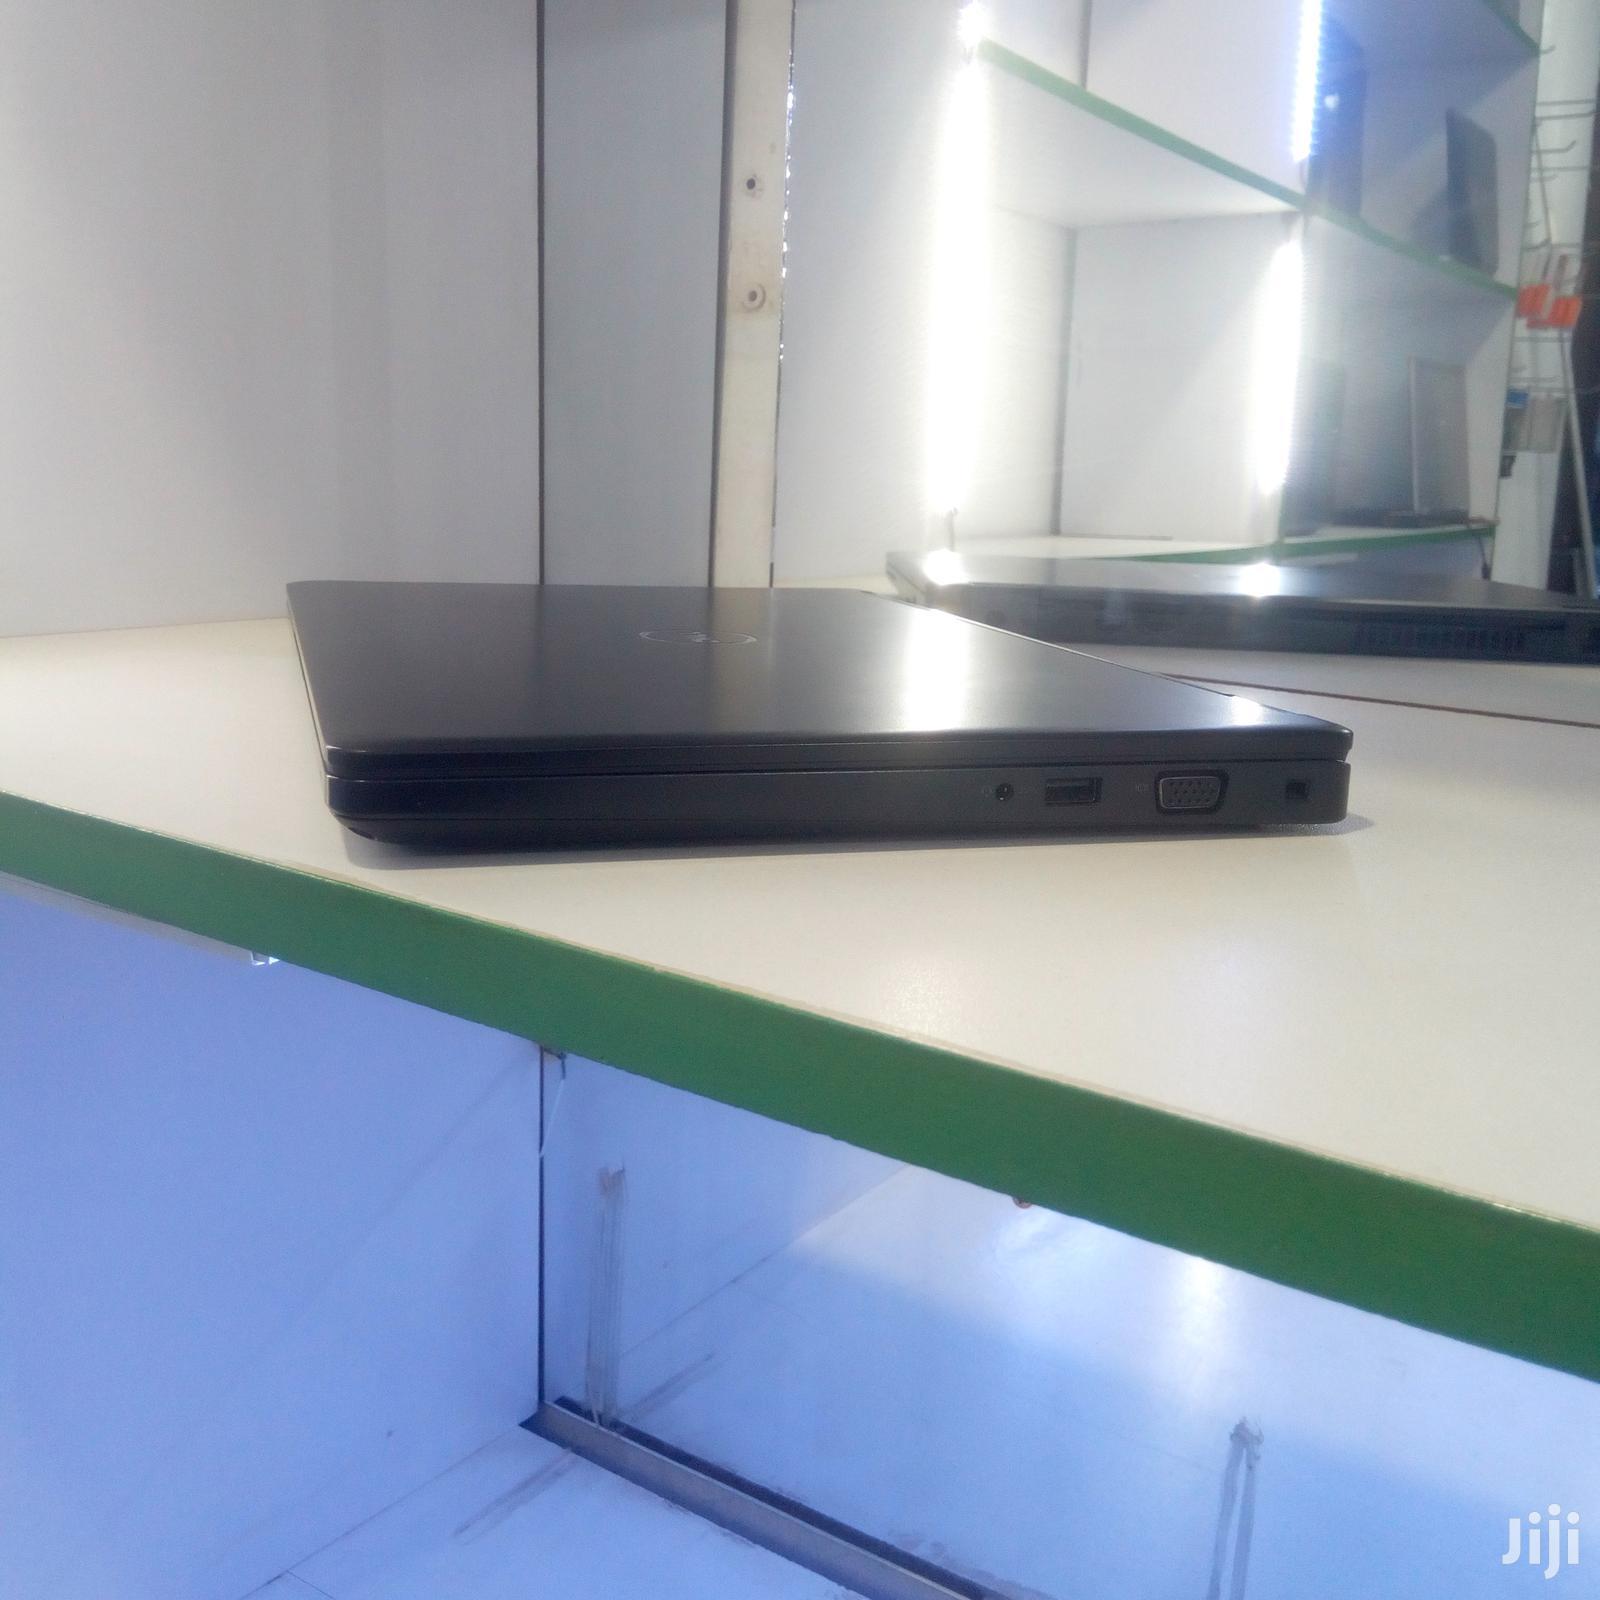 Laptop Dell Latitude 5480 8GB Intel Core i7 HDD 500GB | Laptops & Computers for sale in Kampala, Central Region, Uganda